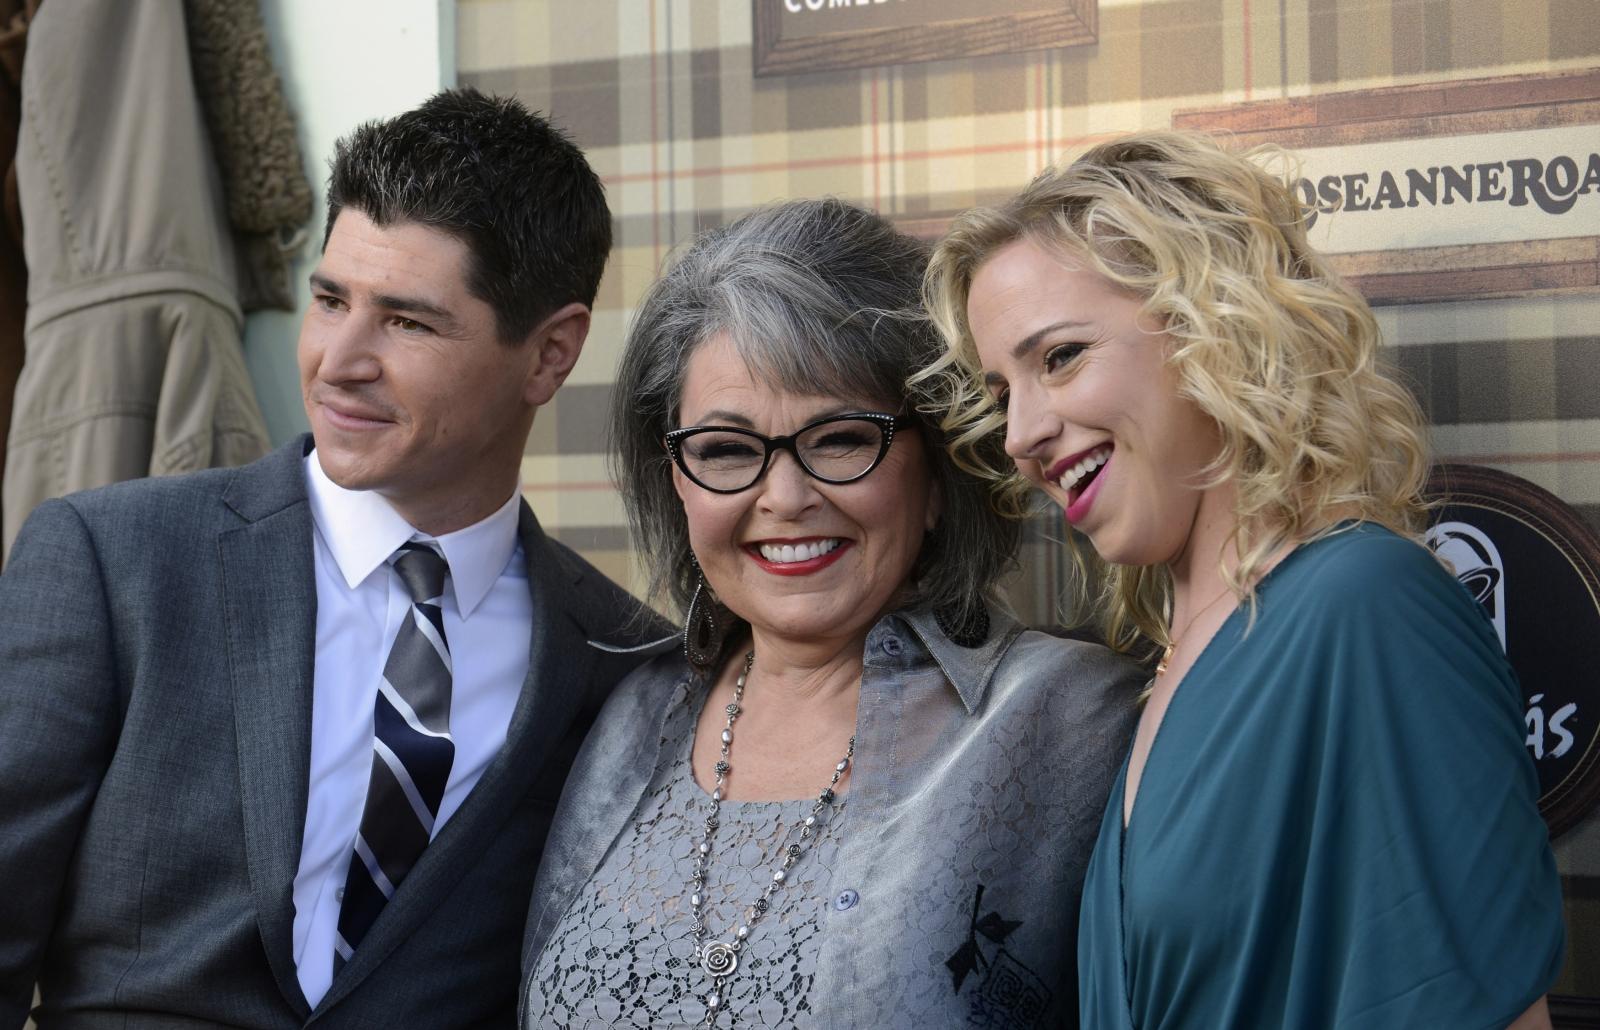 Roseanne TV show reunion